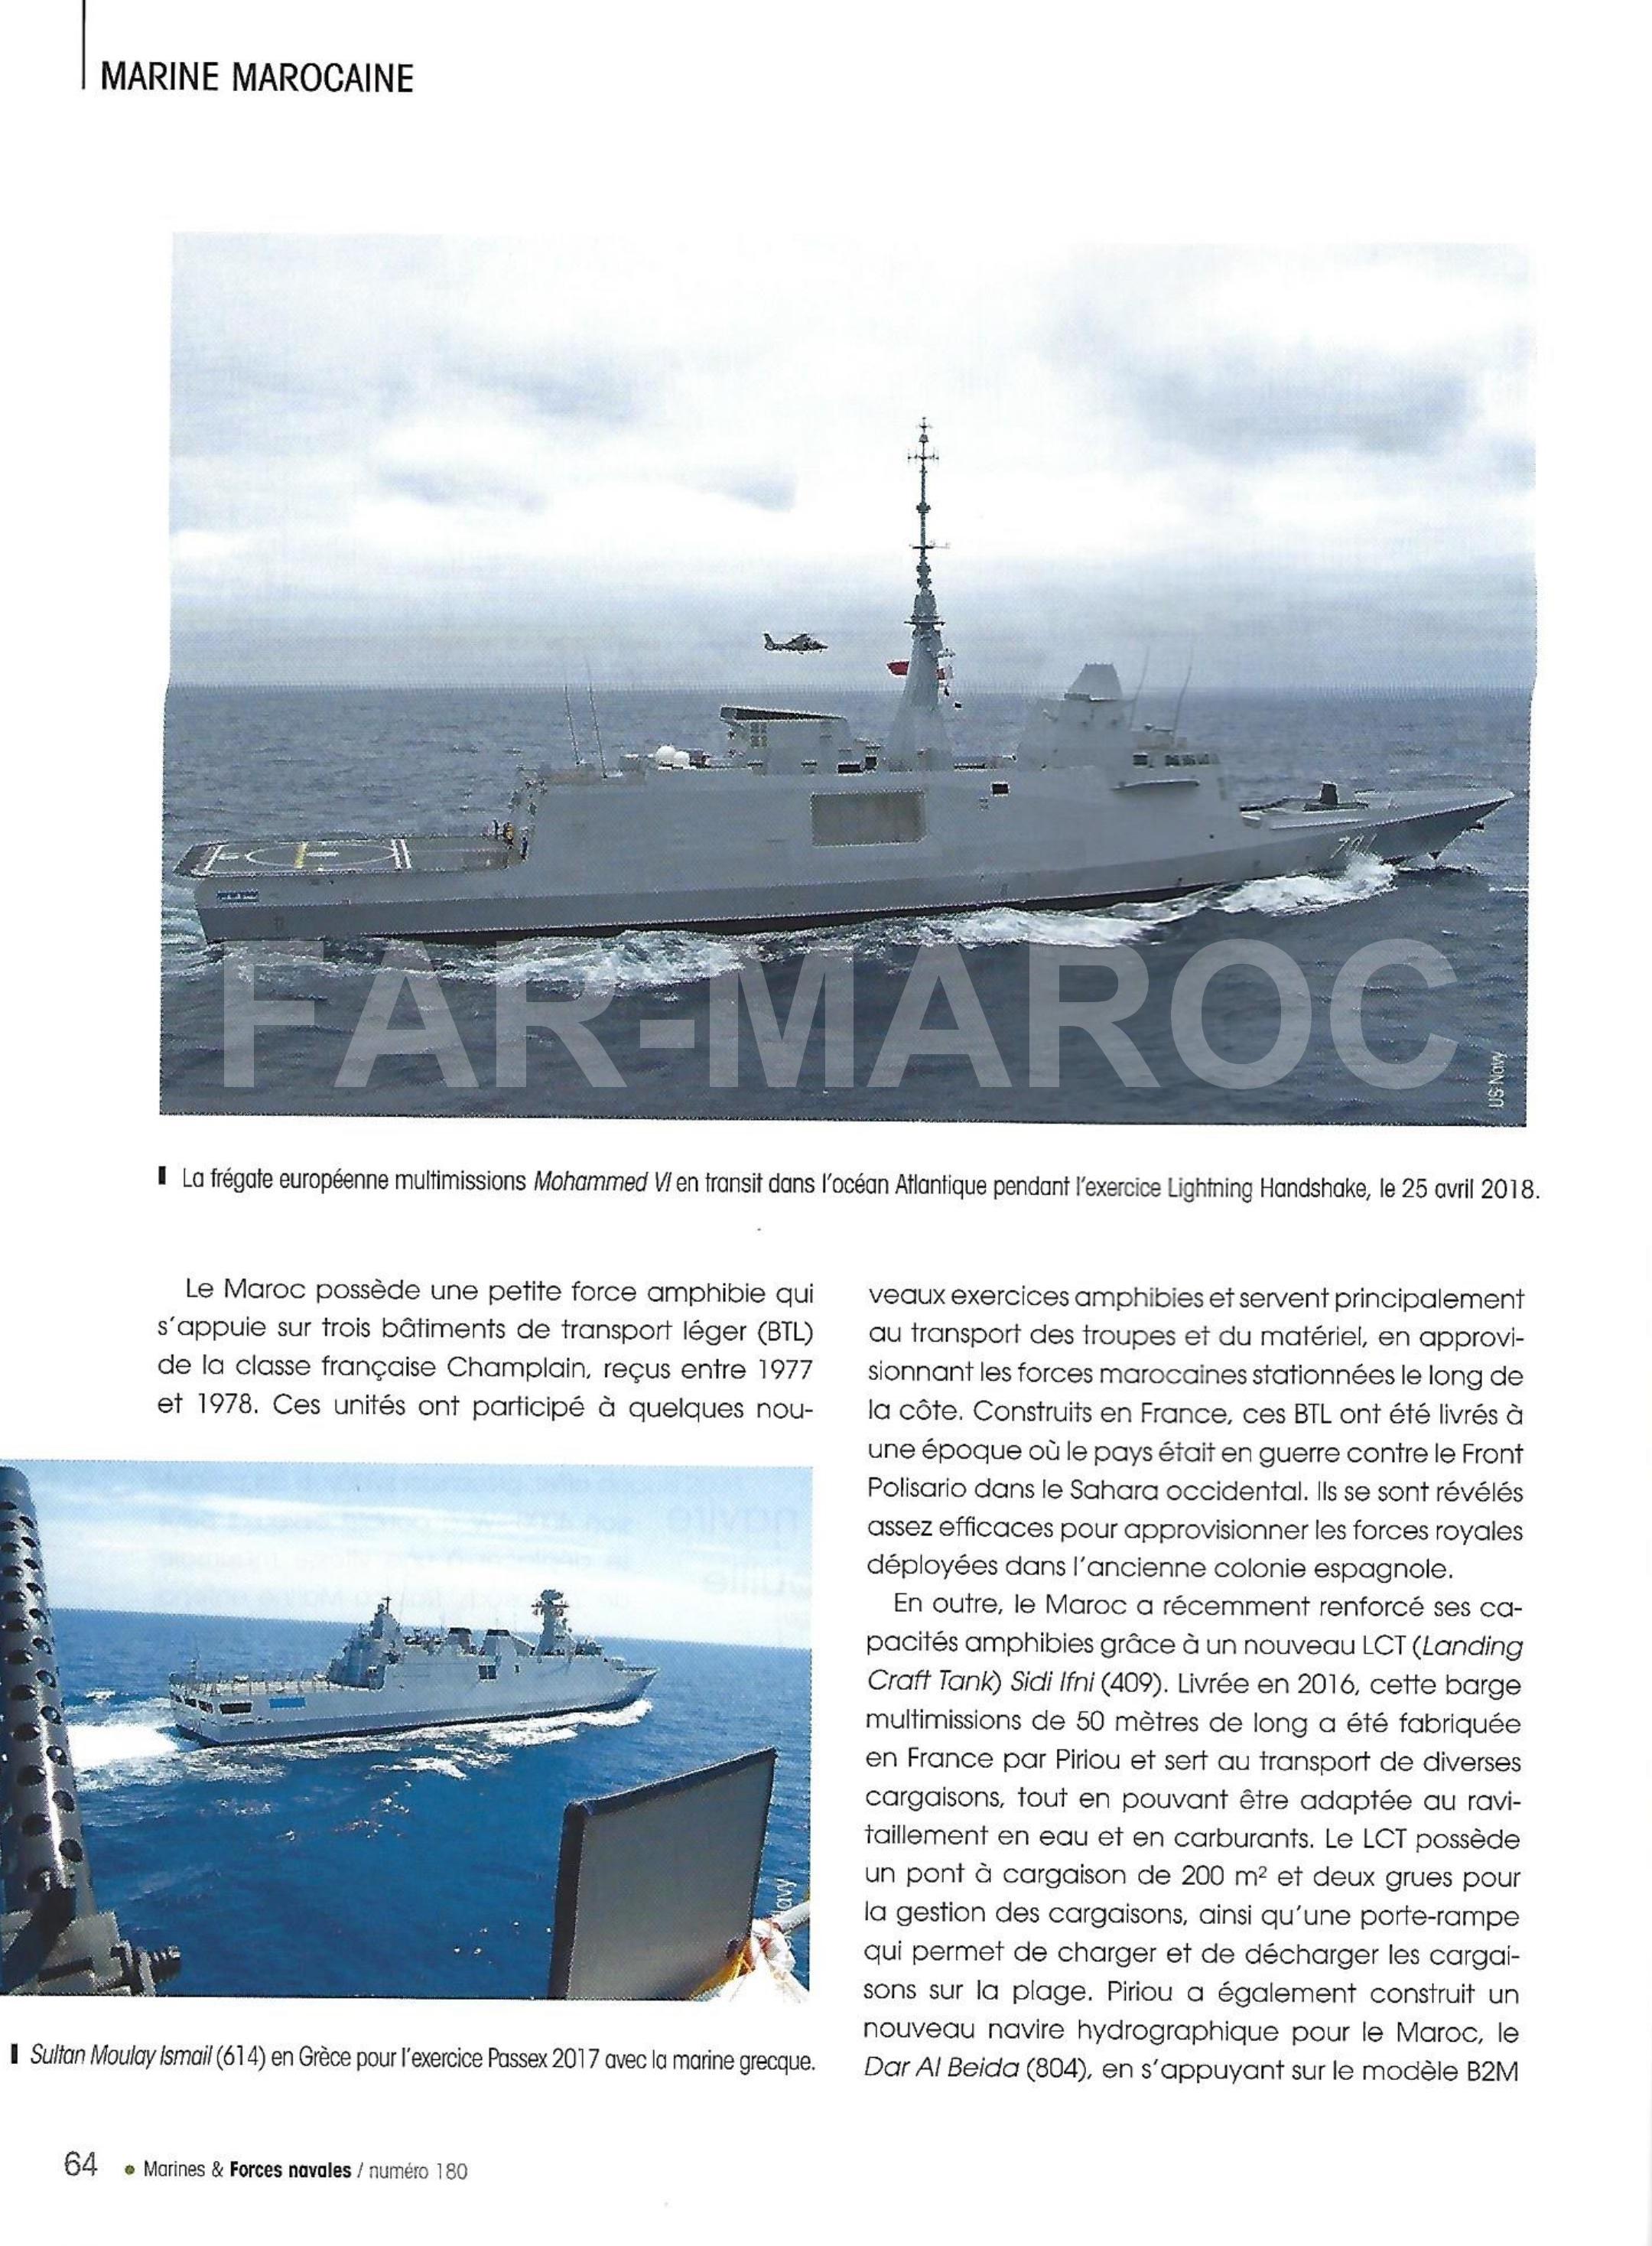 Articles à propos de la Marine Royale Marocaine 47598456991_08670dec2a_o